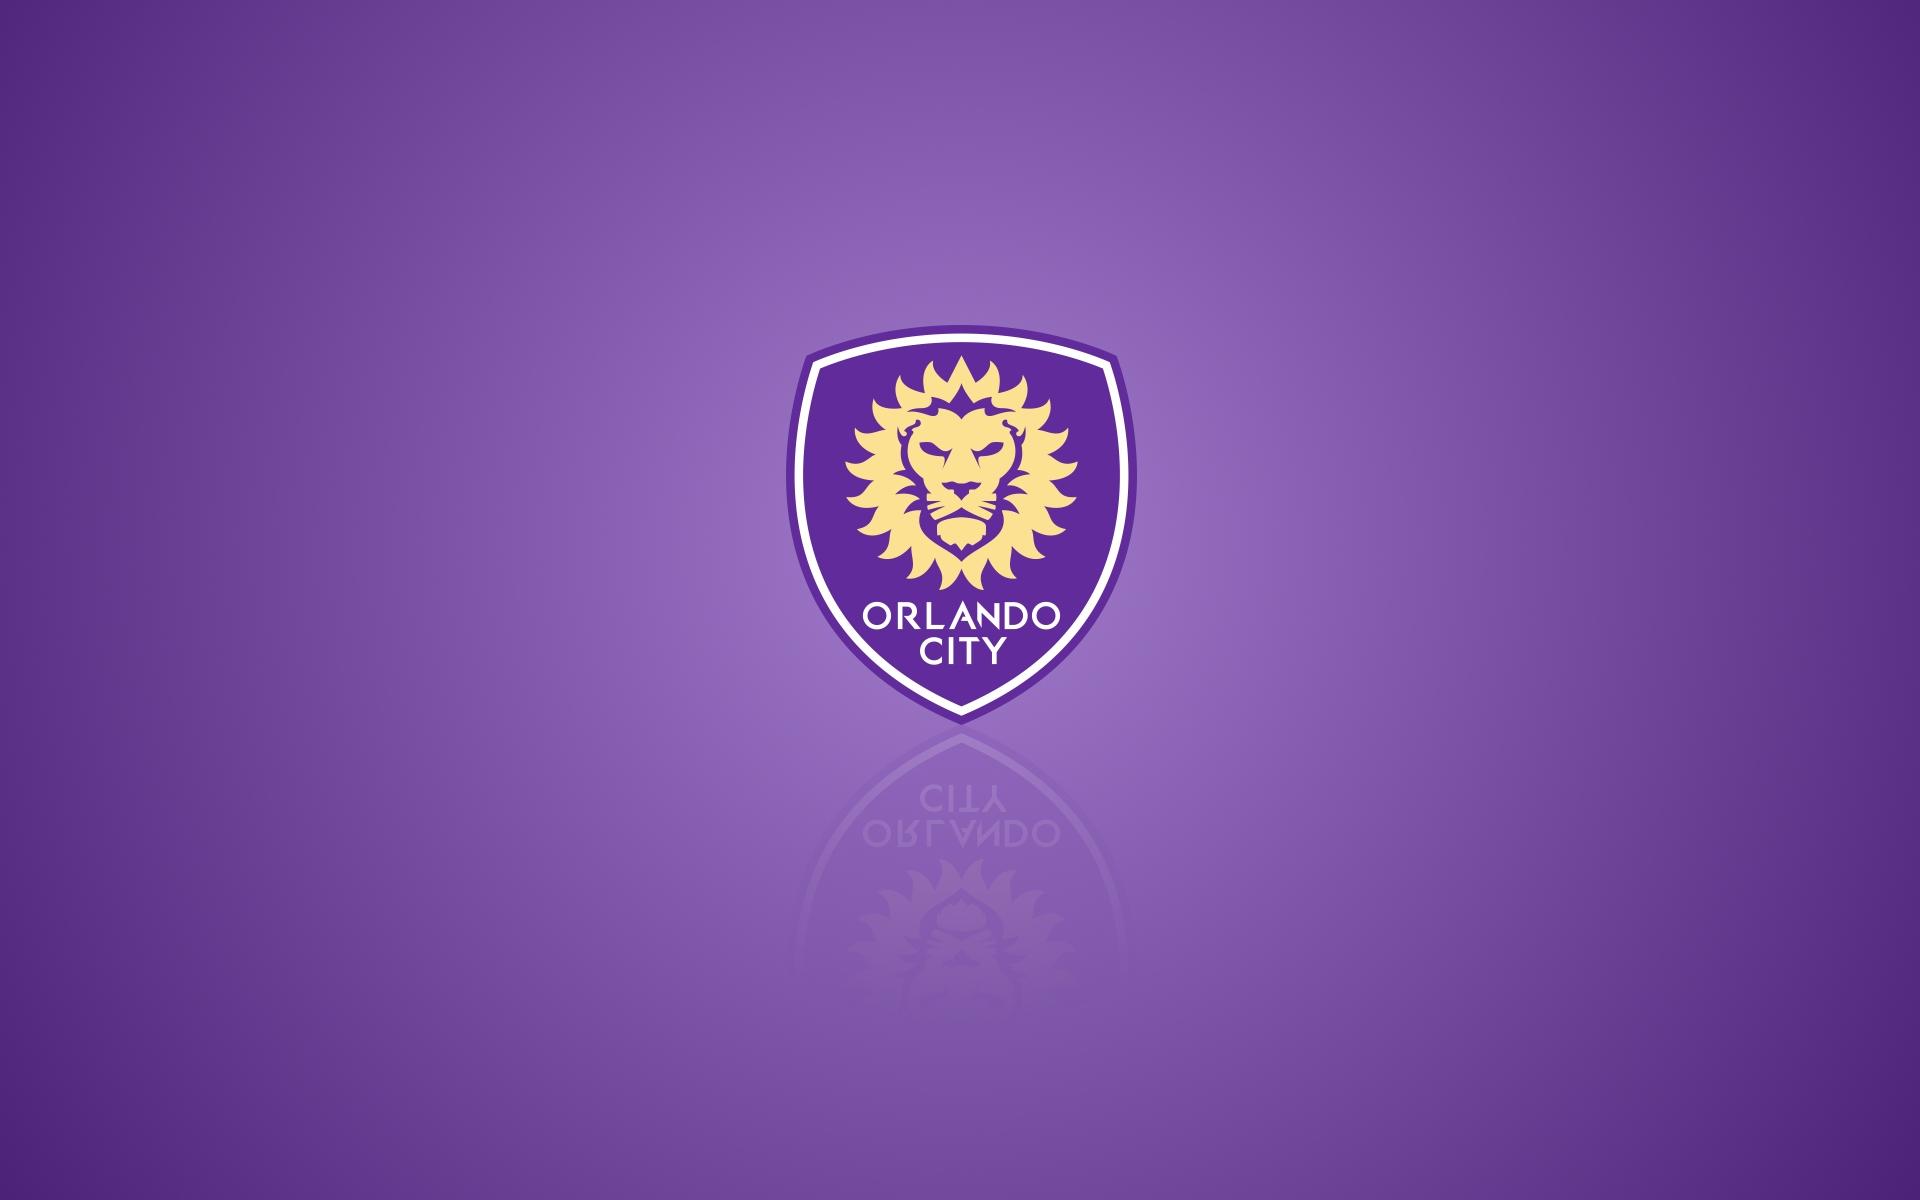 Orlando City Sc Logos Download